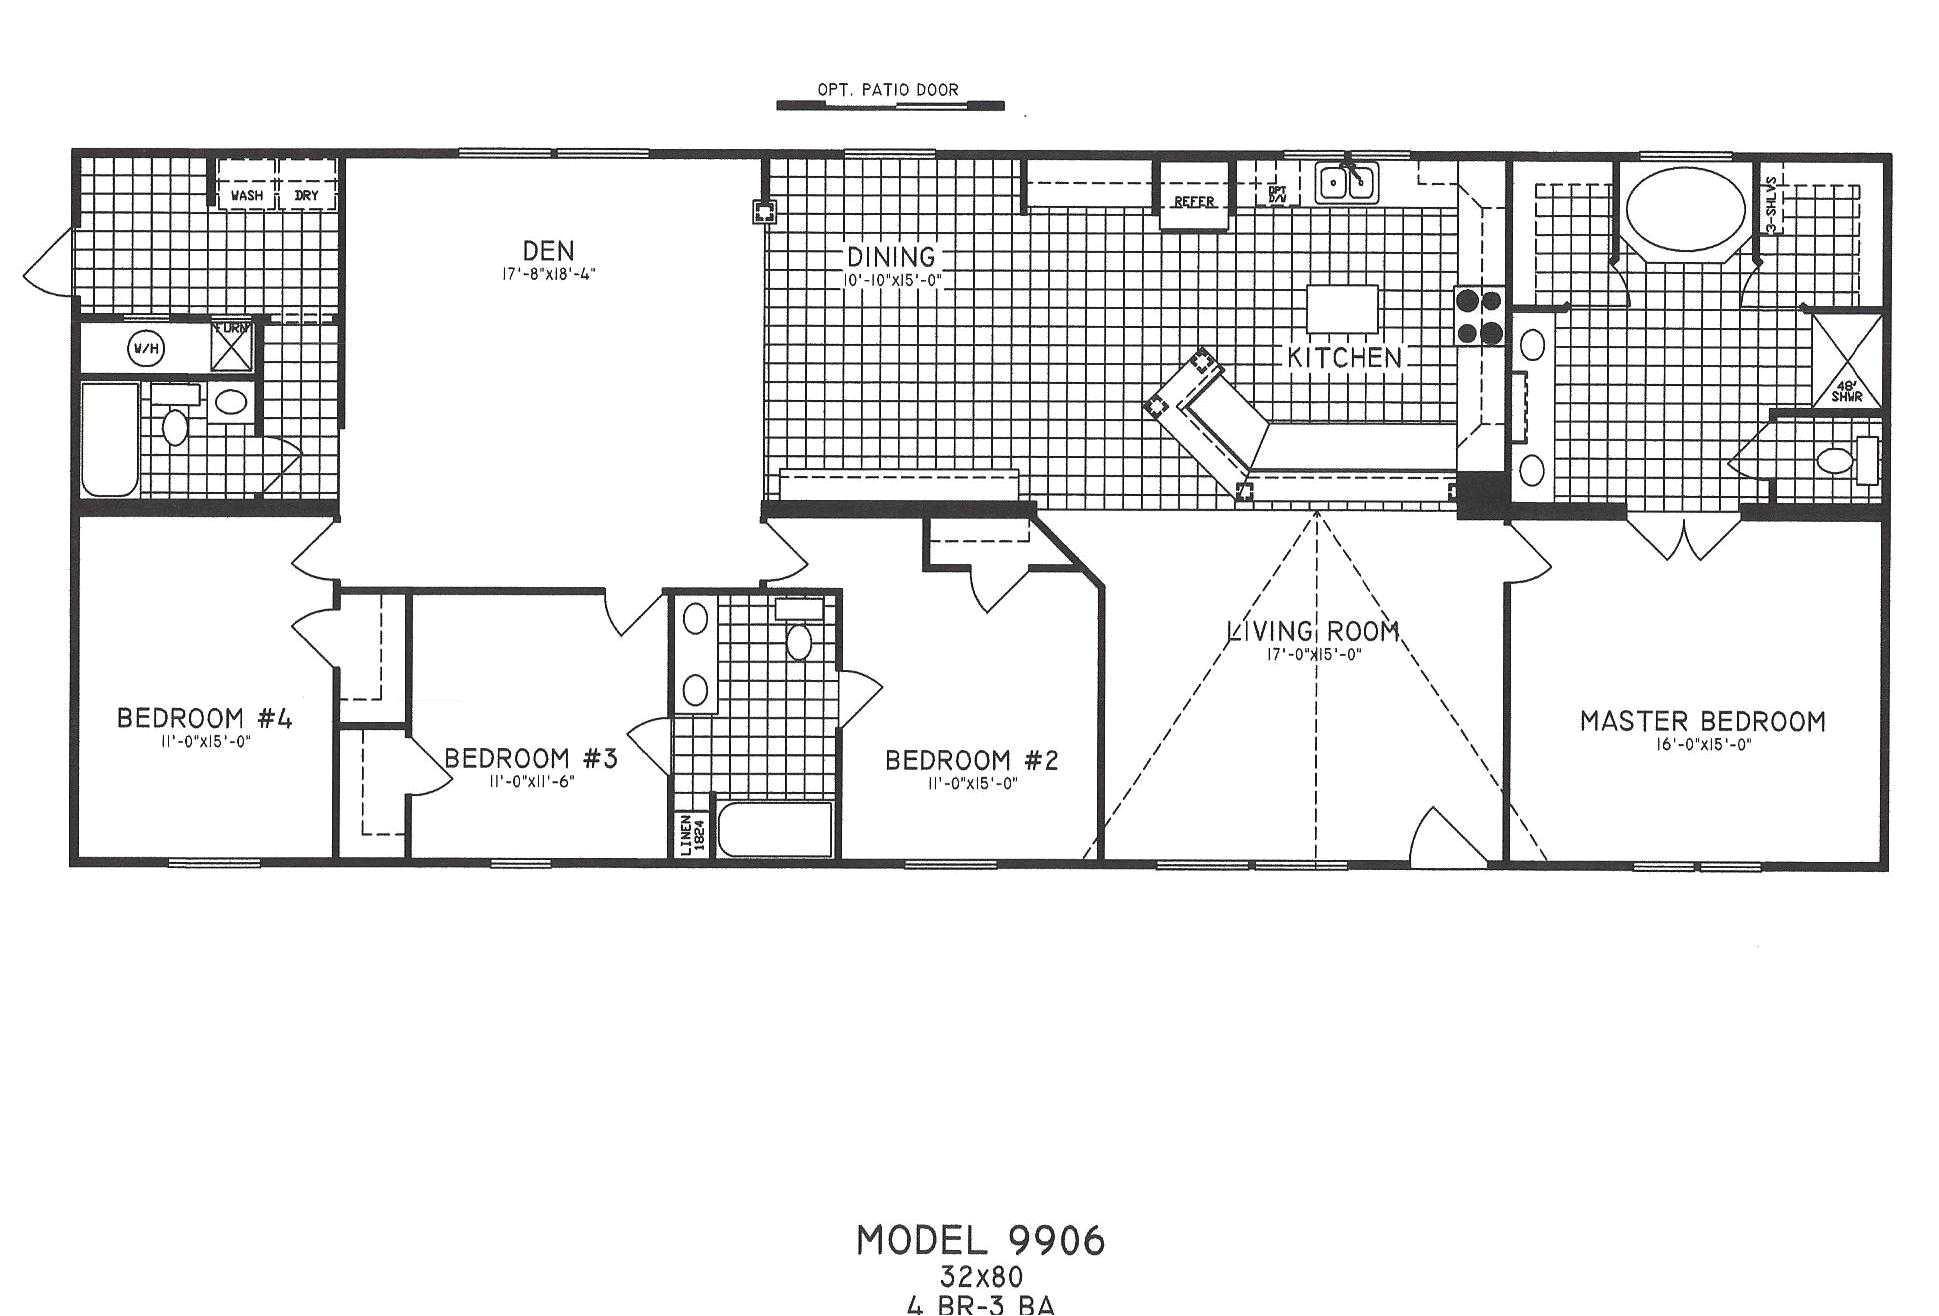 6 Bedroom Manufactured Home Floor Plan | plougonver.com